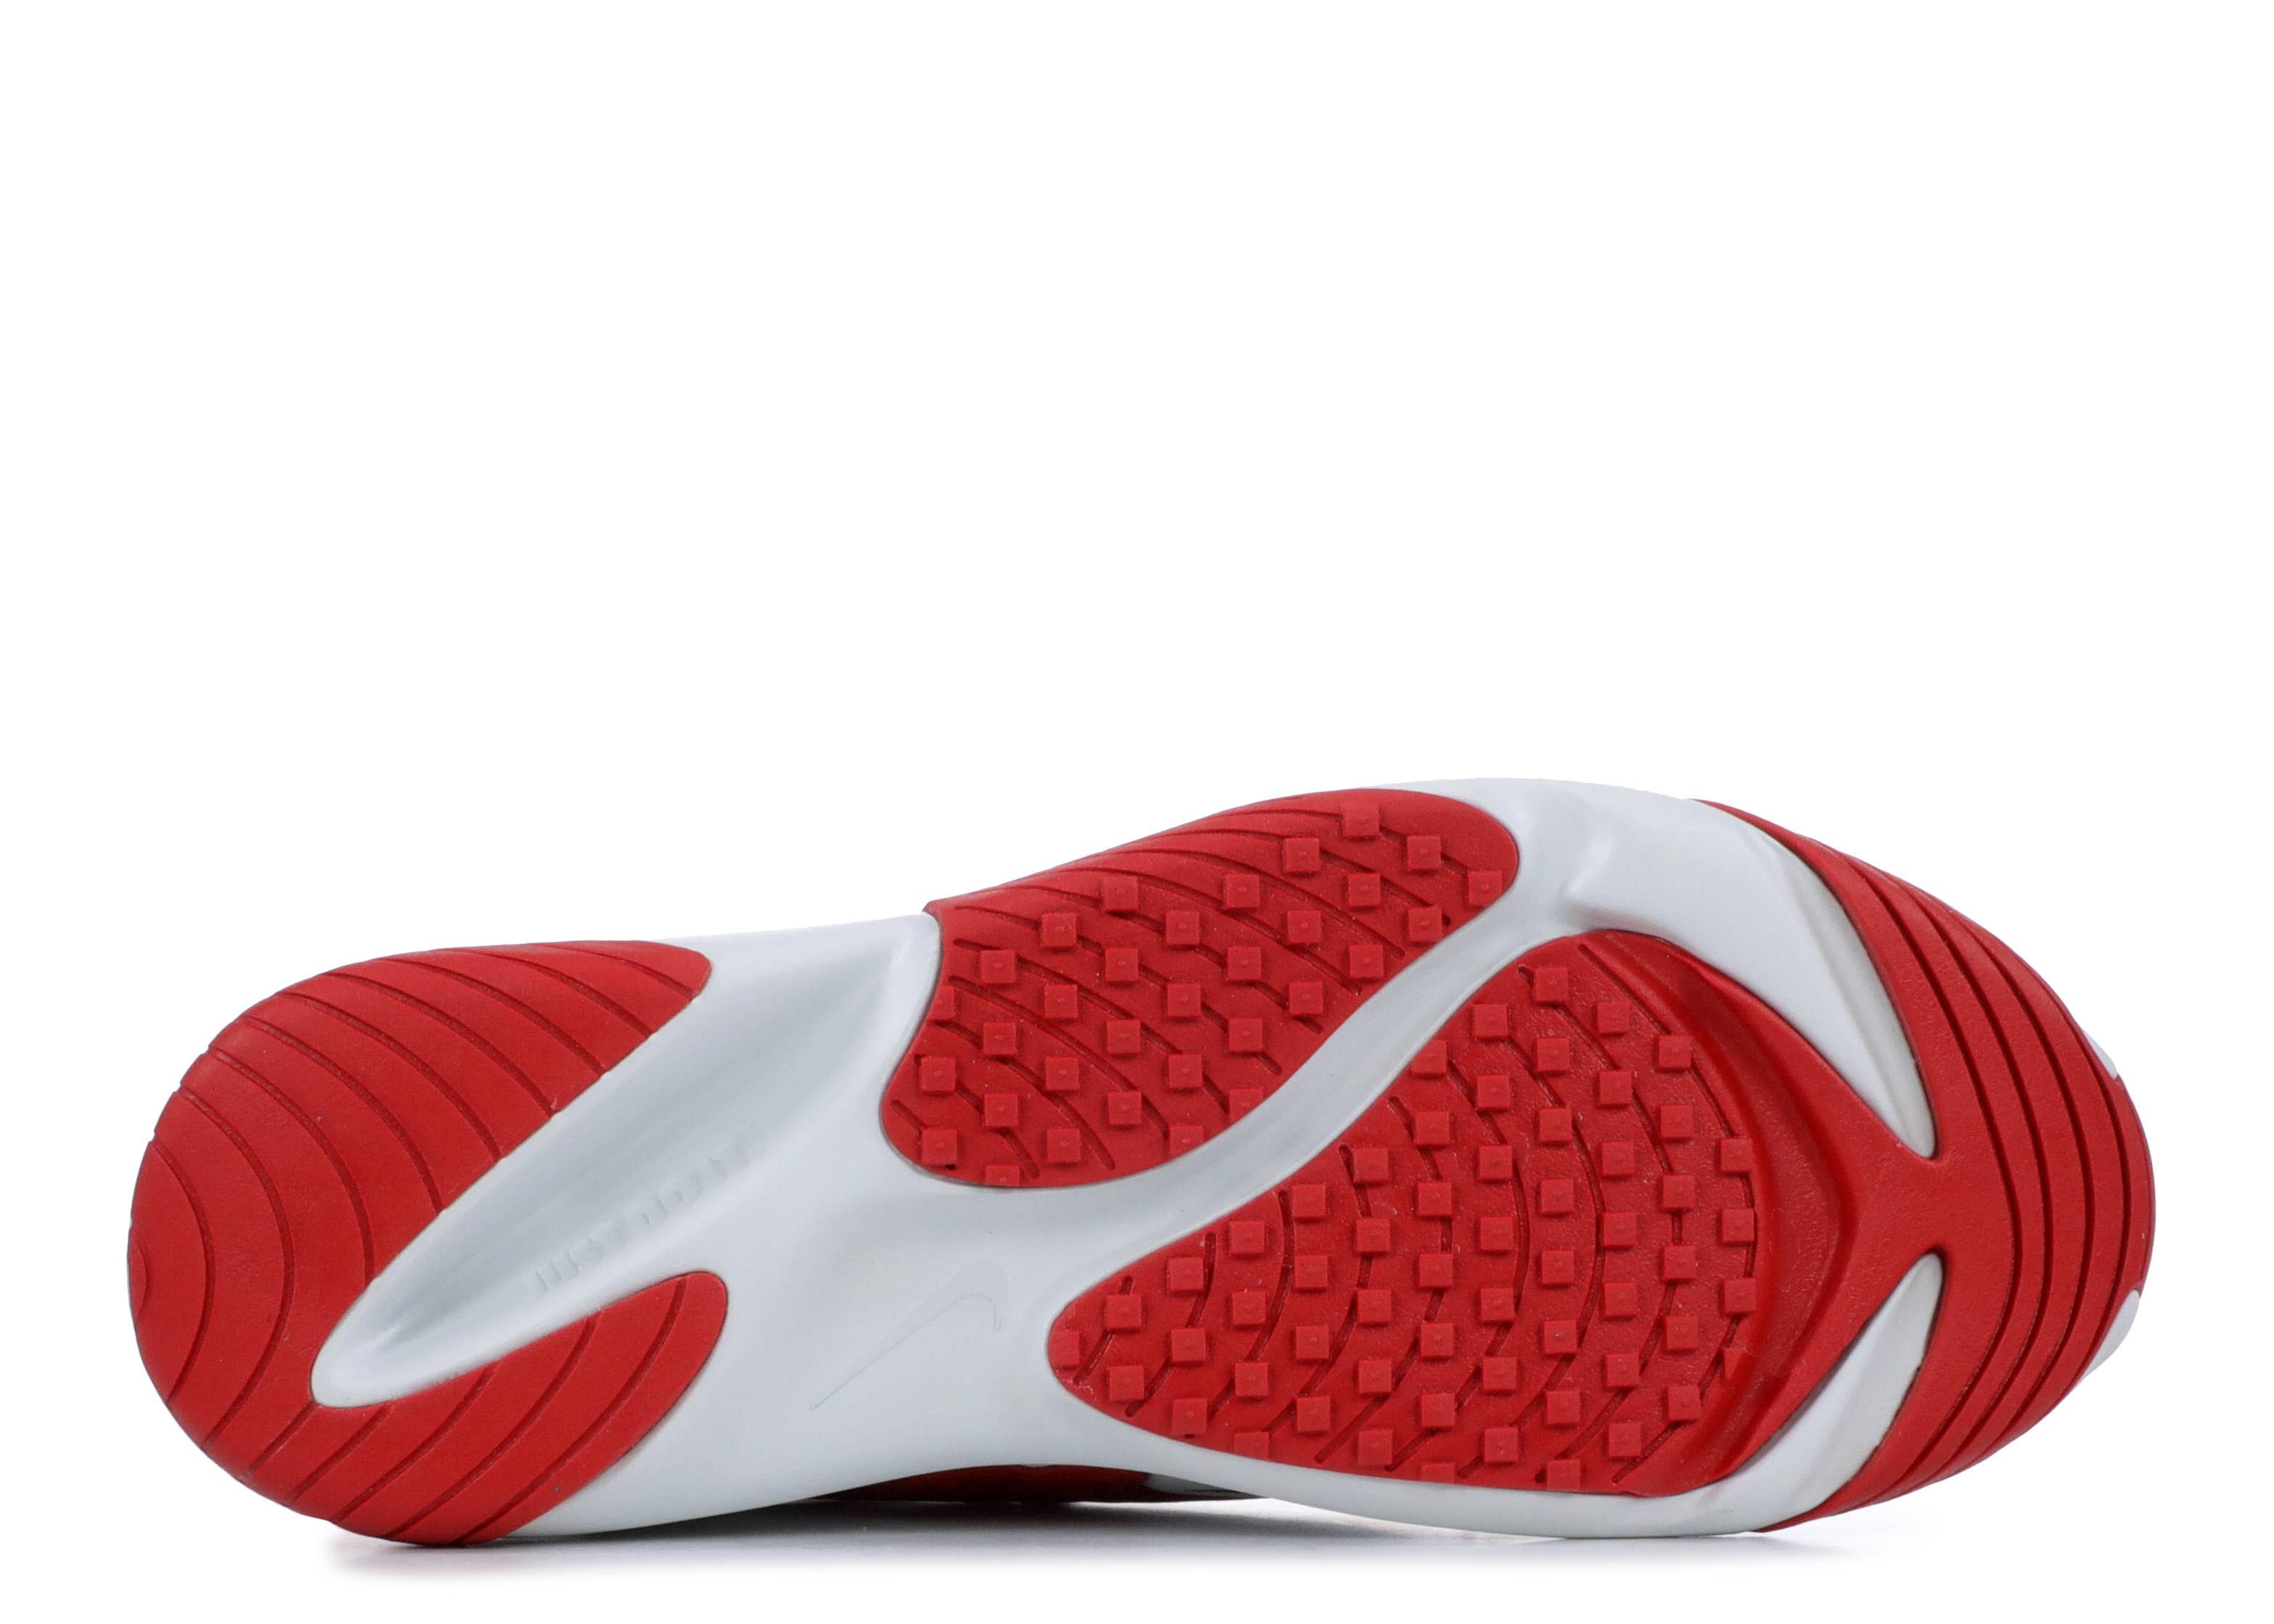 Mayo audible mosaico  Zoom 2K 'University Red' - Nike - AO0269 102 - off white/university red-obsidian  | Flight Club